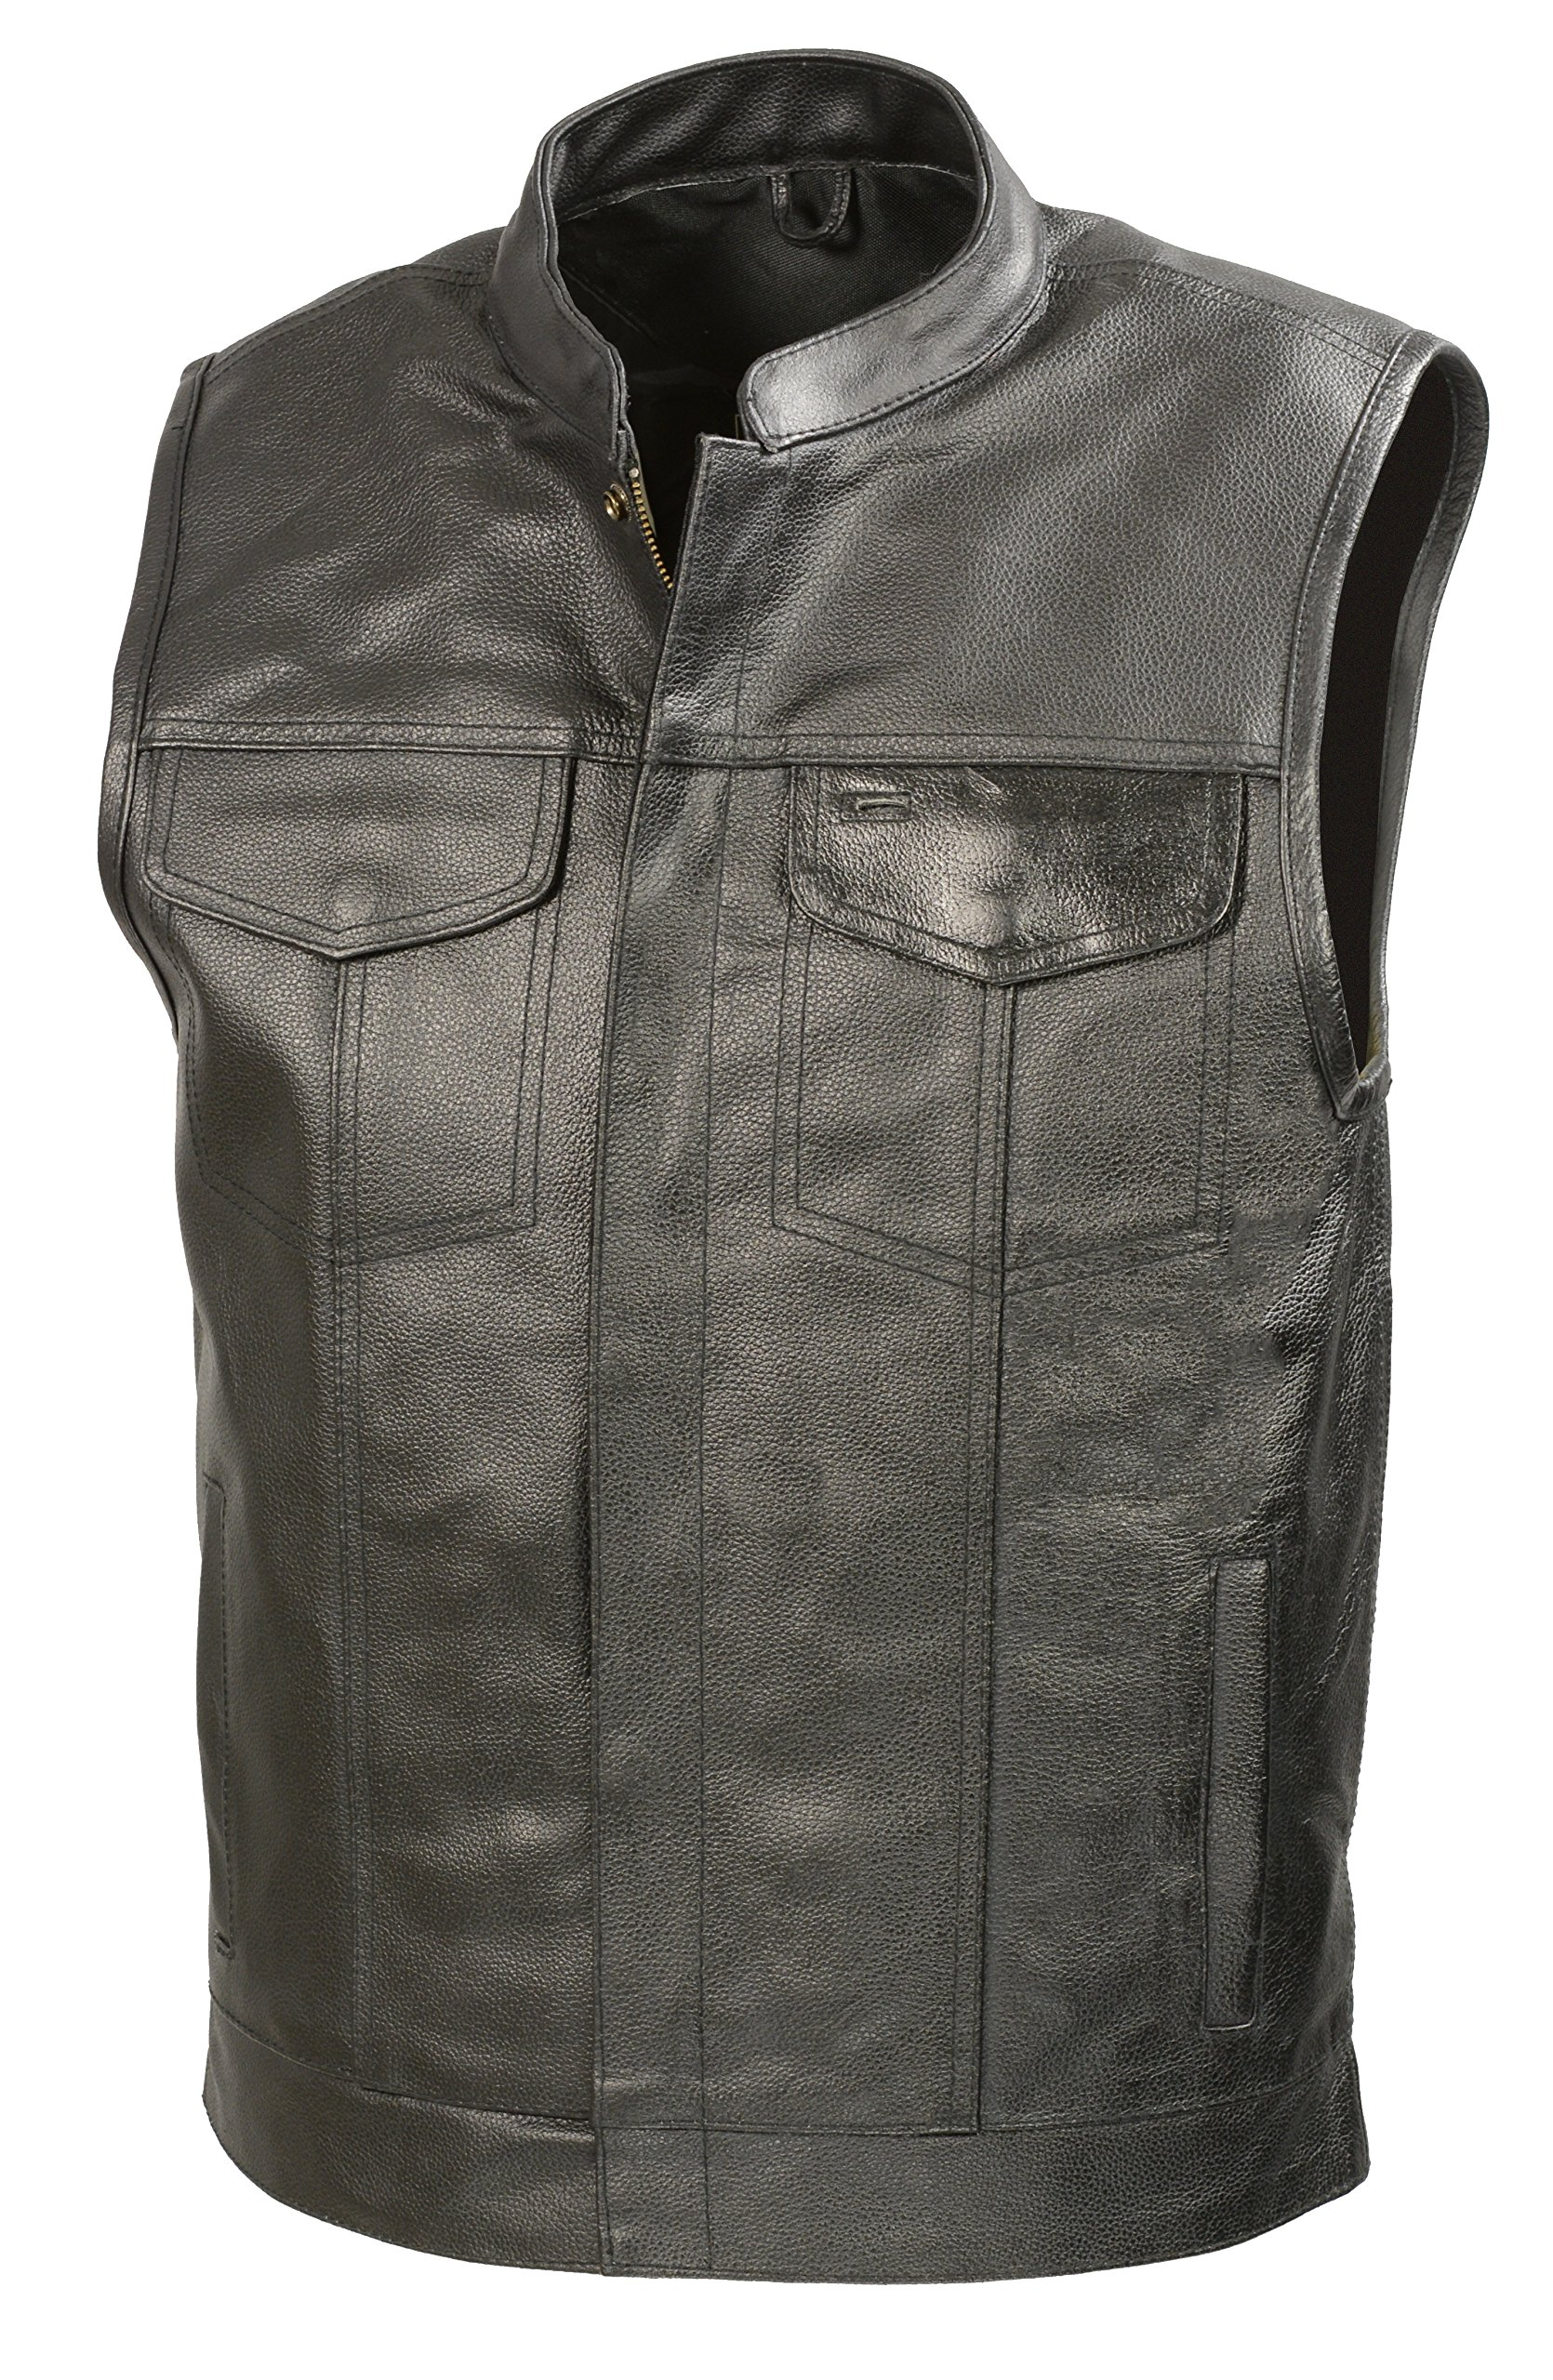 SOA Mens Leather Club Style Vest W/Gun Pockets, Leather Biker Vest (Black, 2X)